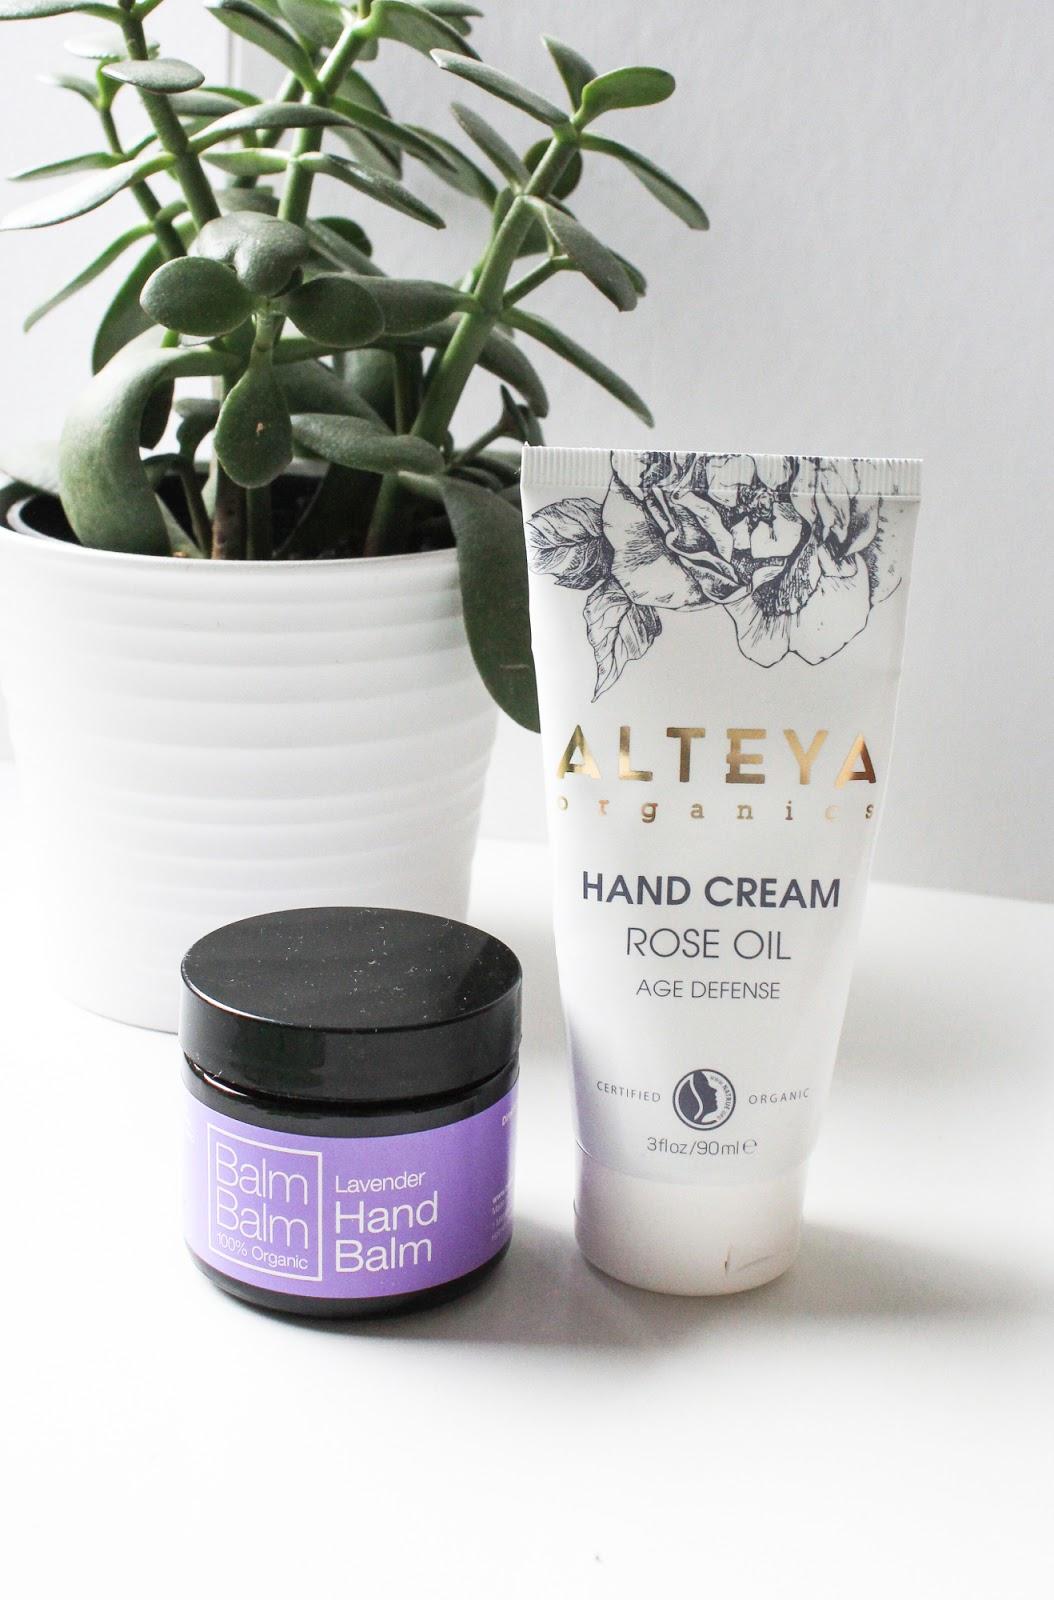 Balm Balm Lavender Hand Balm, Alteya Organics Hand Cream Age Defense. LoveLula